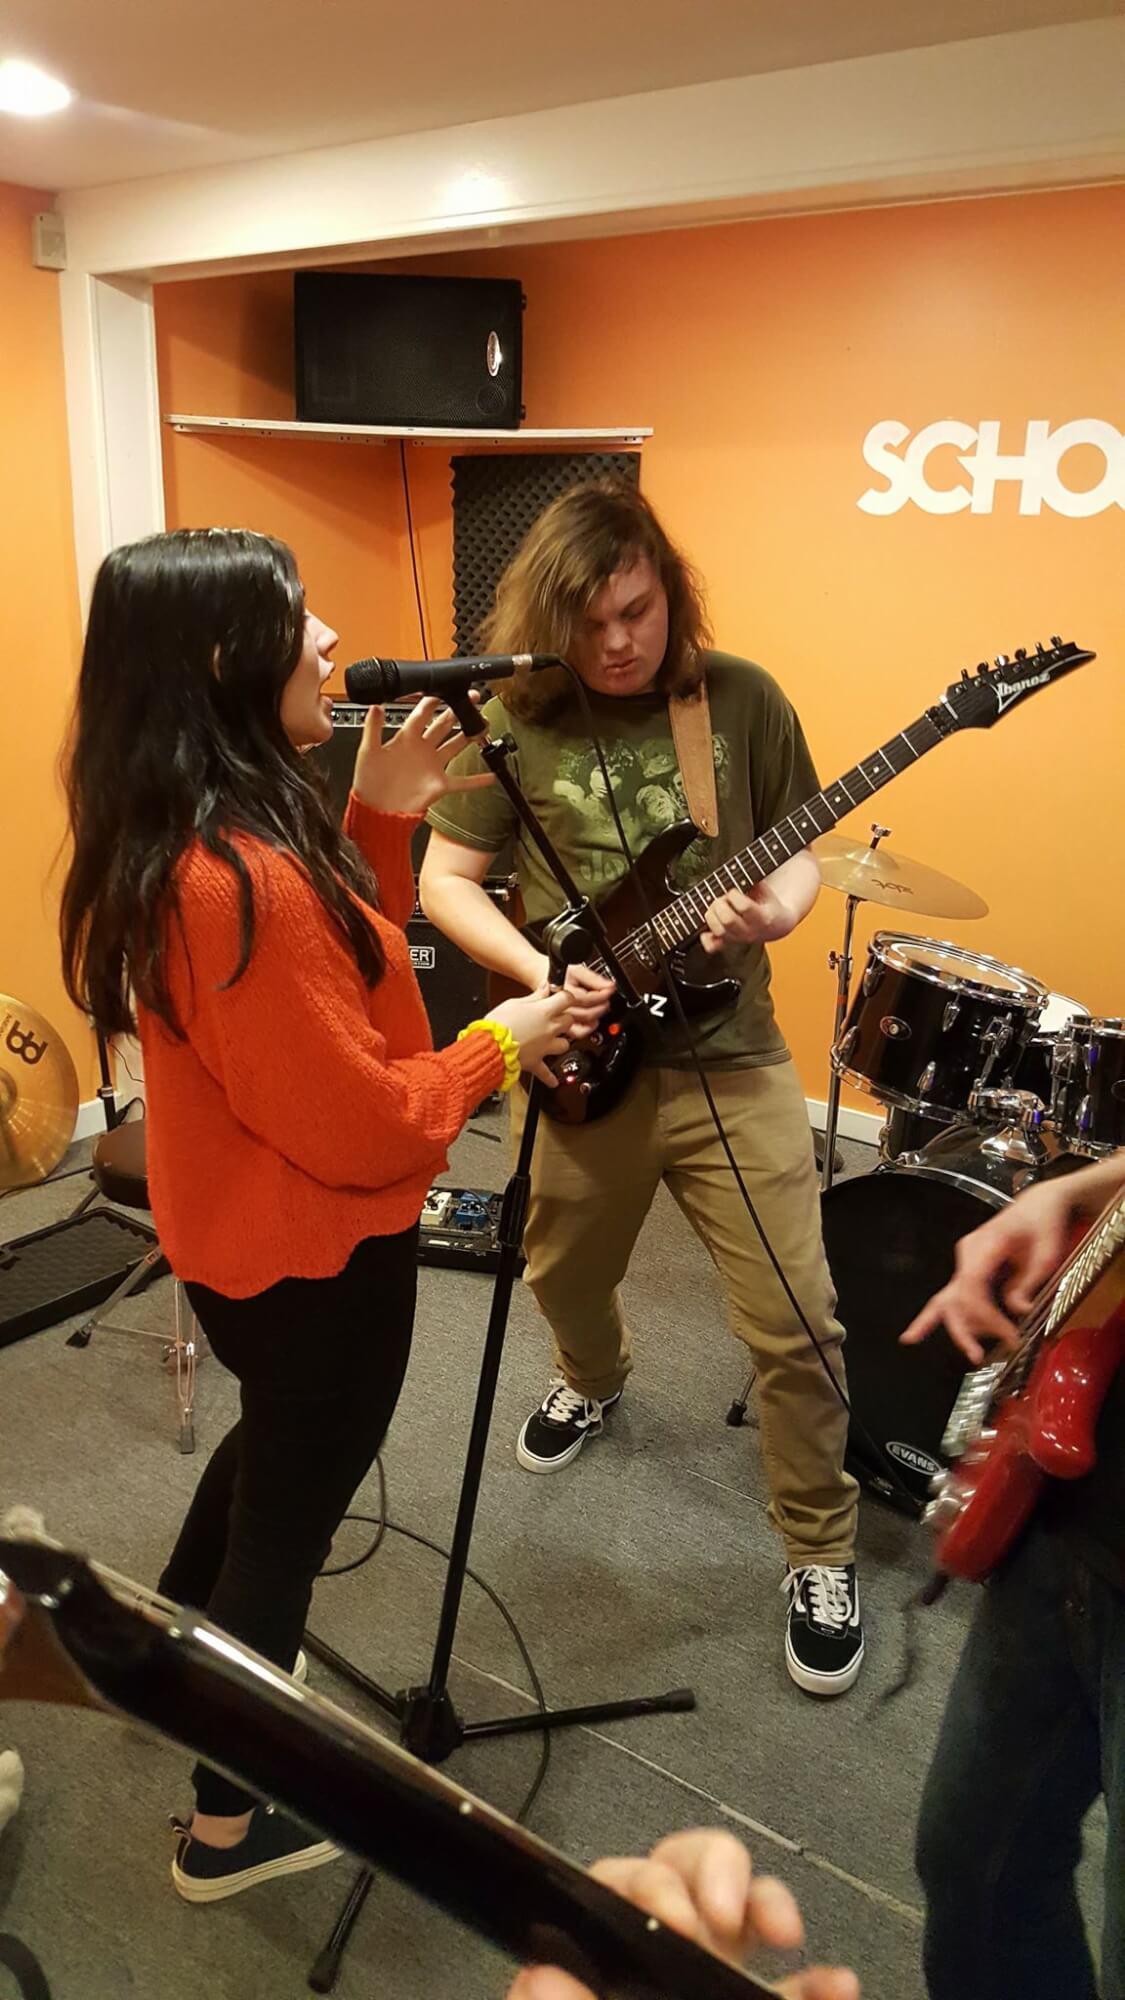 Team work while rehearsing.